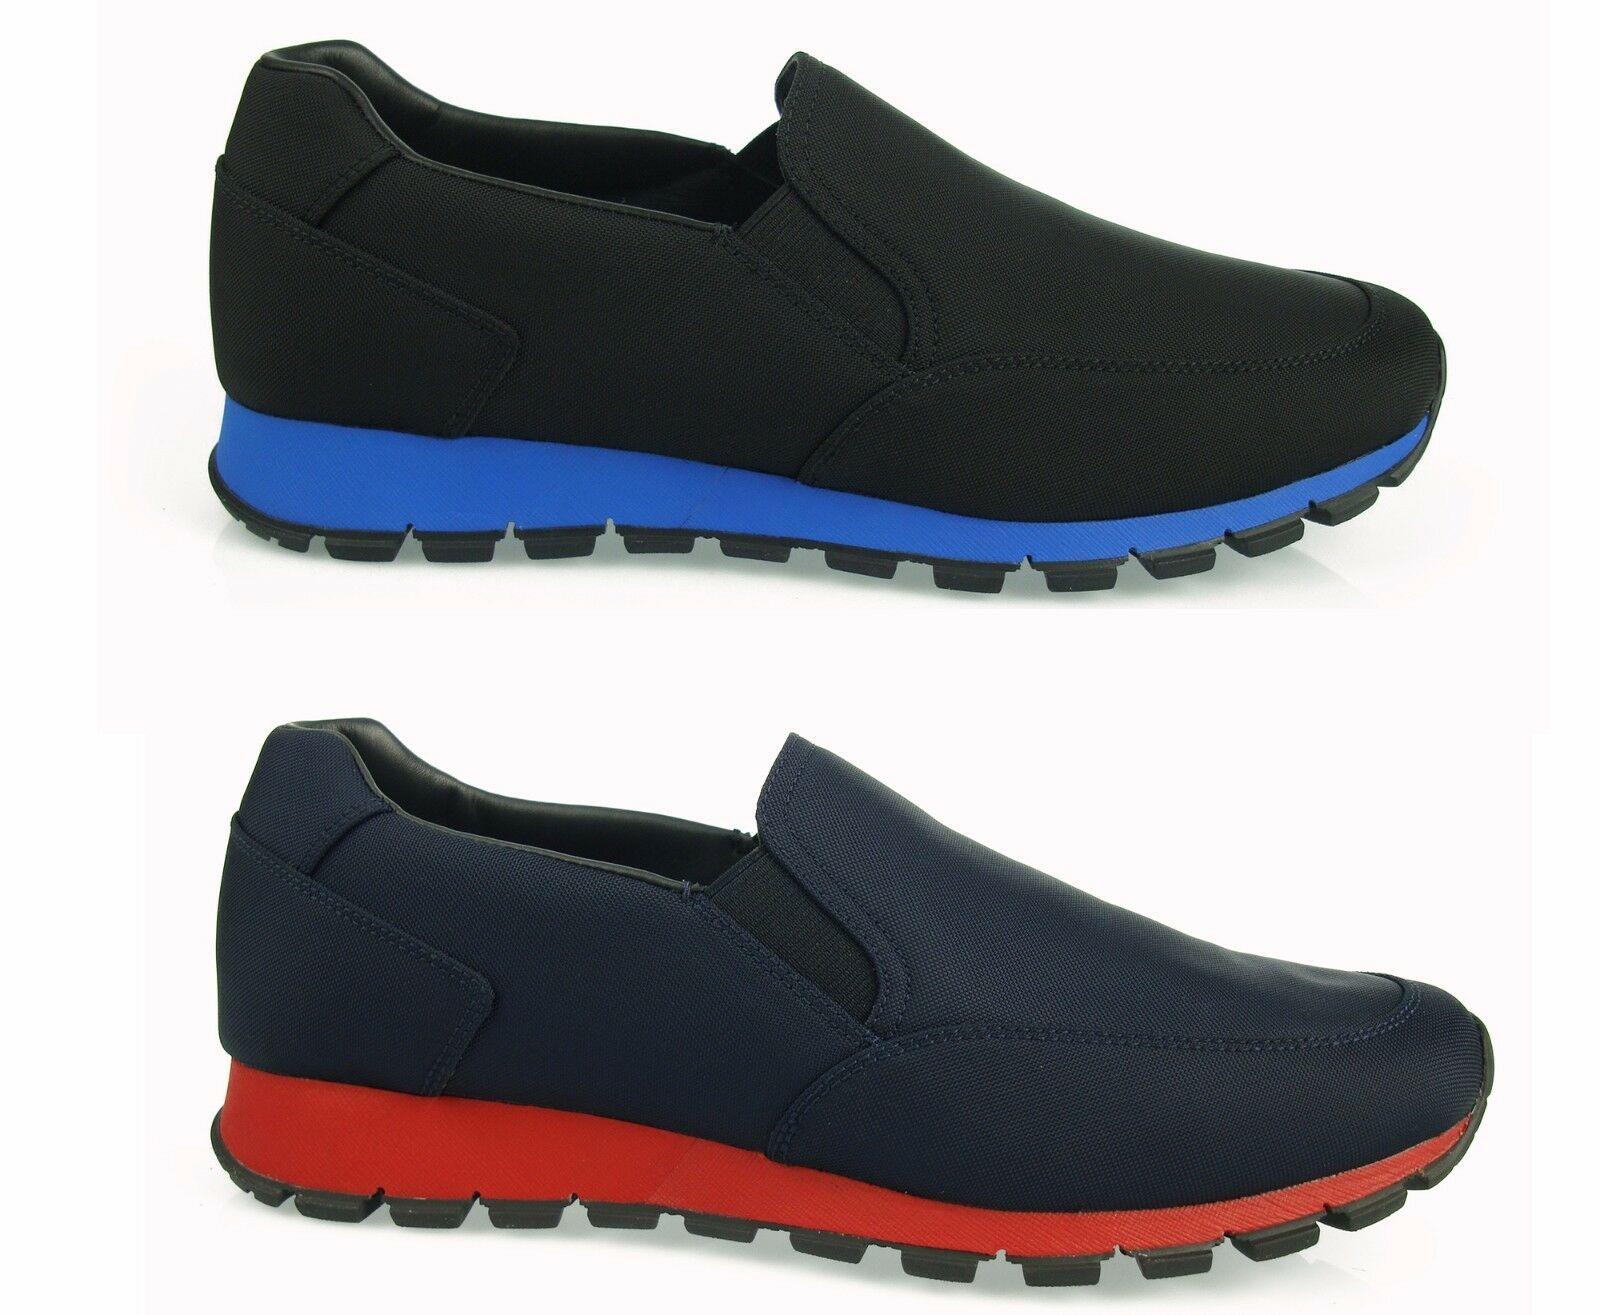 PRADA  scarpe da ginnastica slipper  780 MAN SHOES MADE IN ITALY 100%AUTENTHIC cs16us